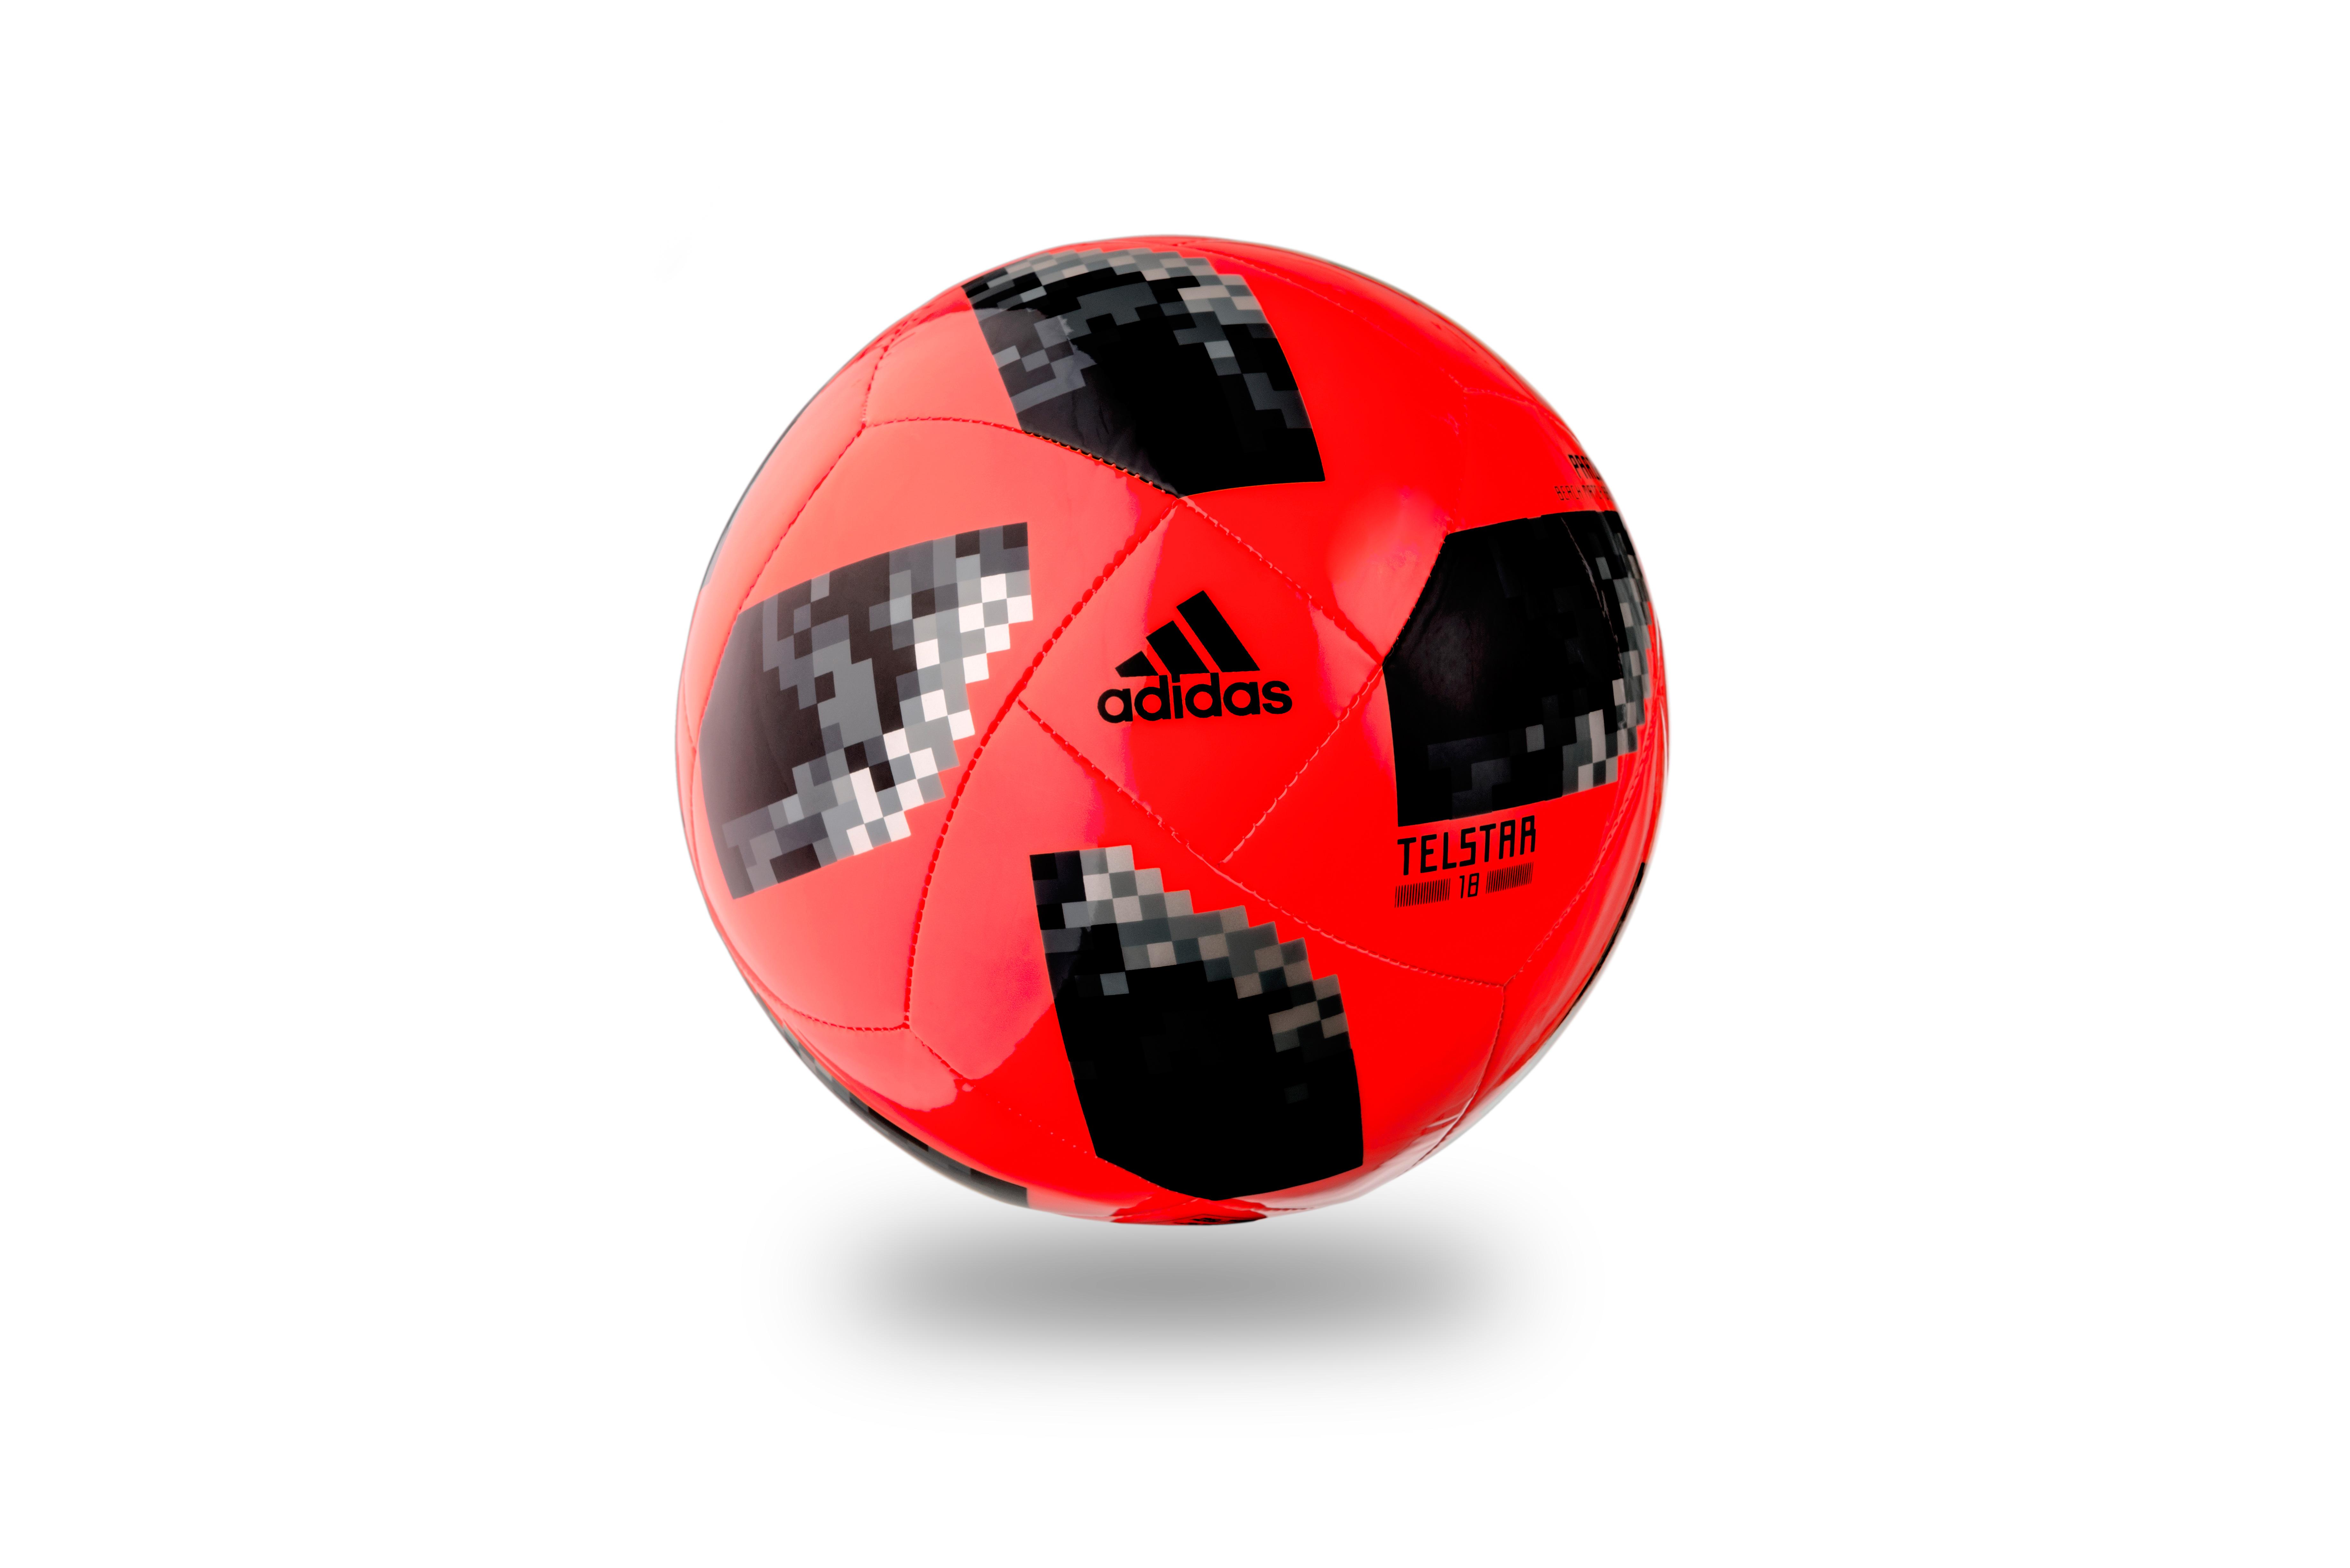 Official adidas Beach Soccer Ball 2018 Telstar Praia – Beach Soccer ... dc528d087